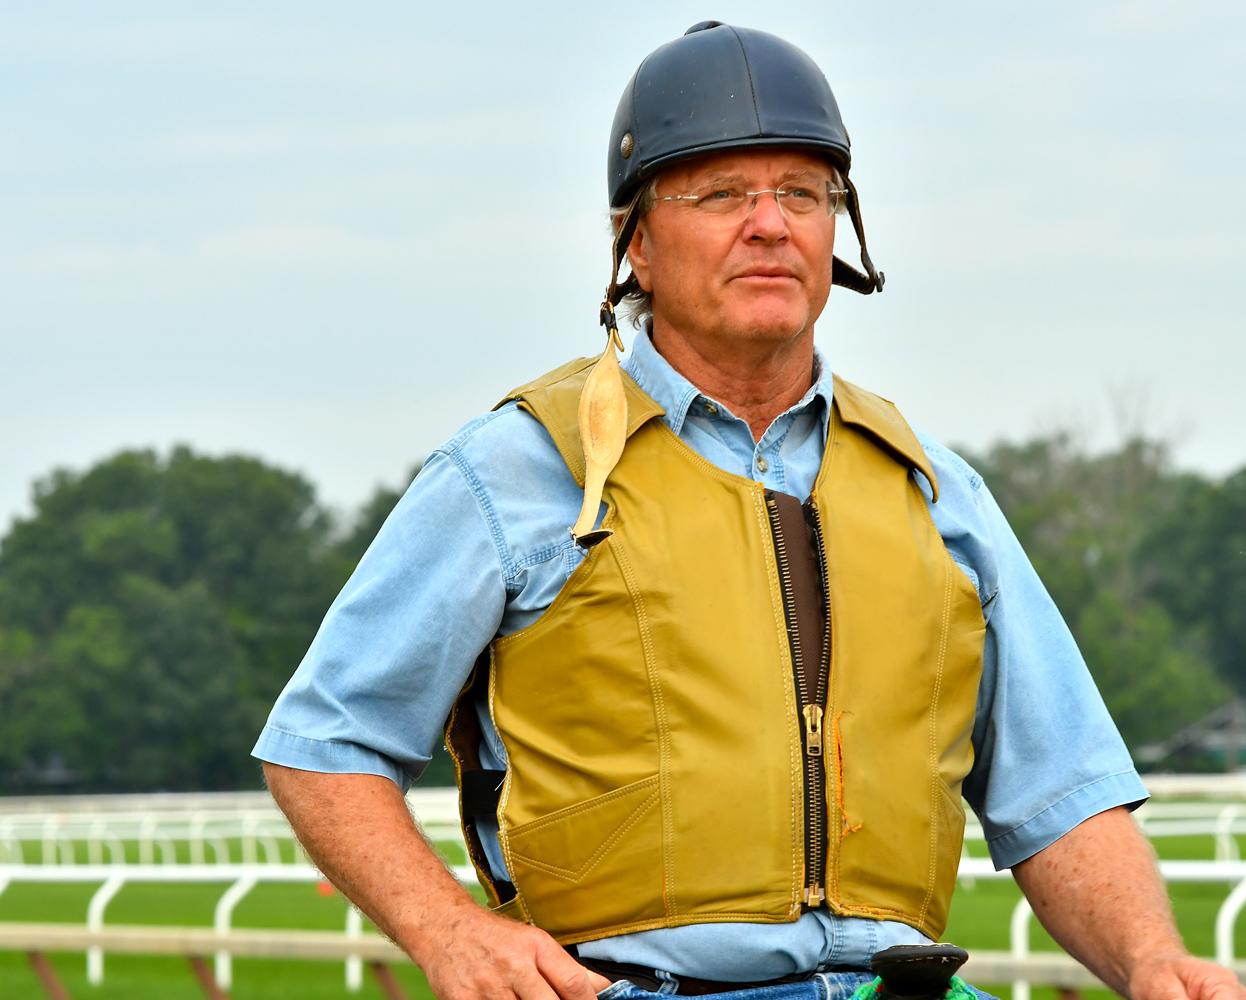 Bill Mott at Saratoga Race Course, August 2018 (Brien Bouyea)